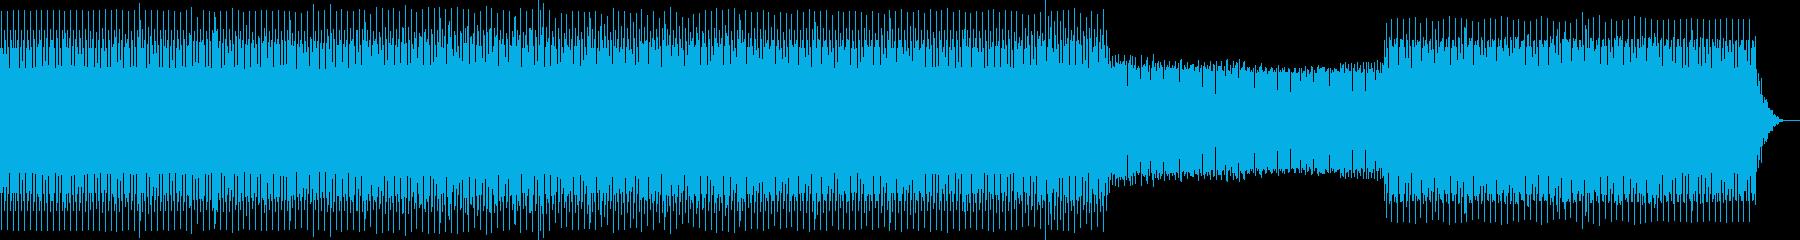 technoの再生済みの波形